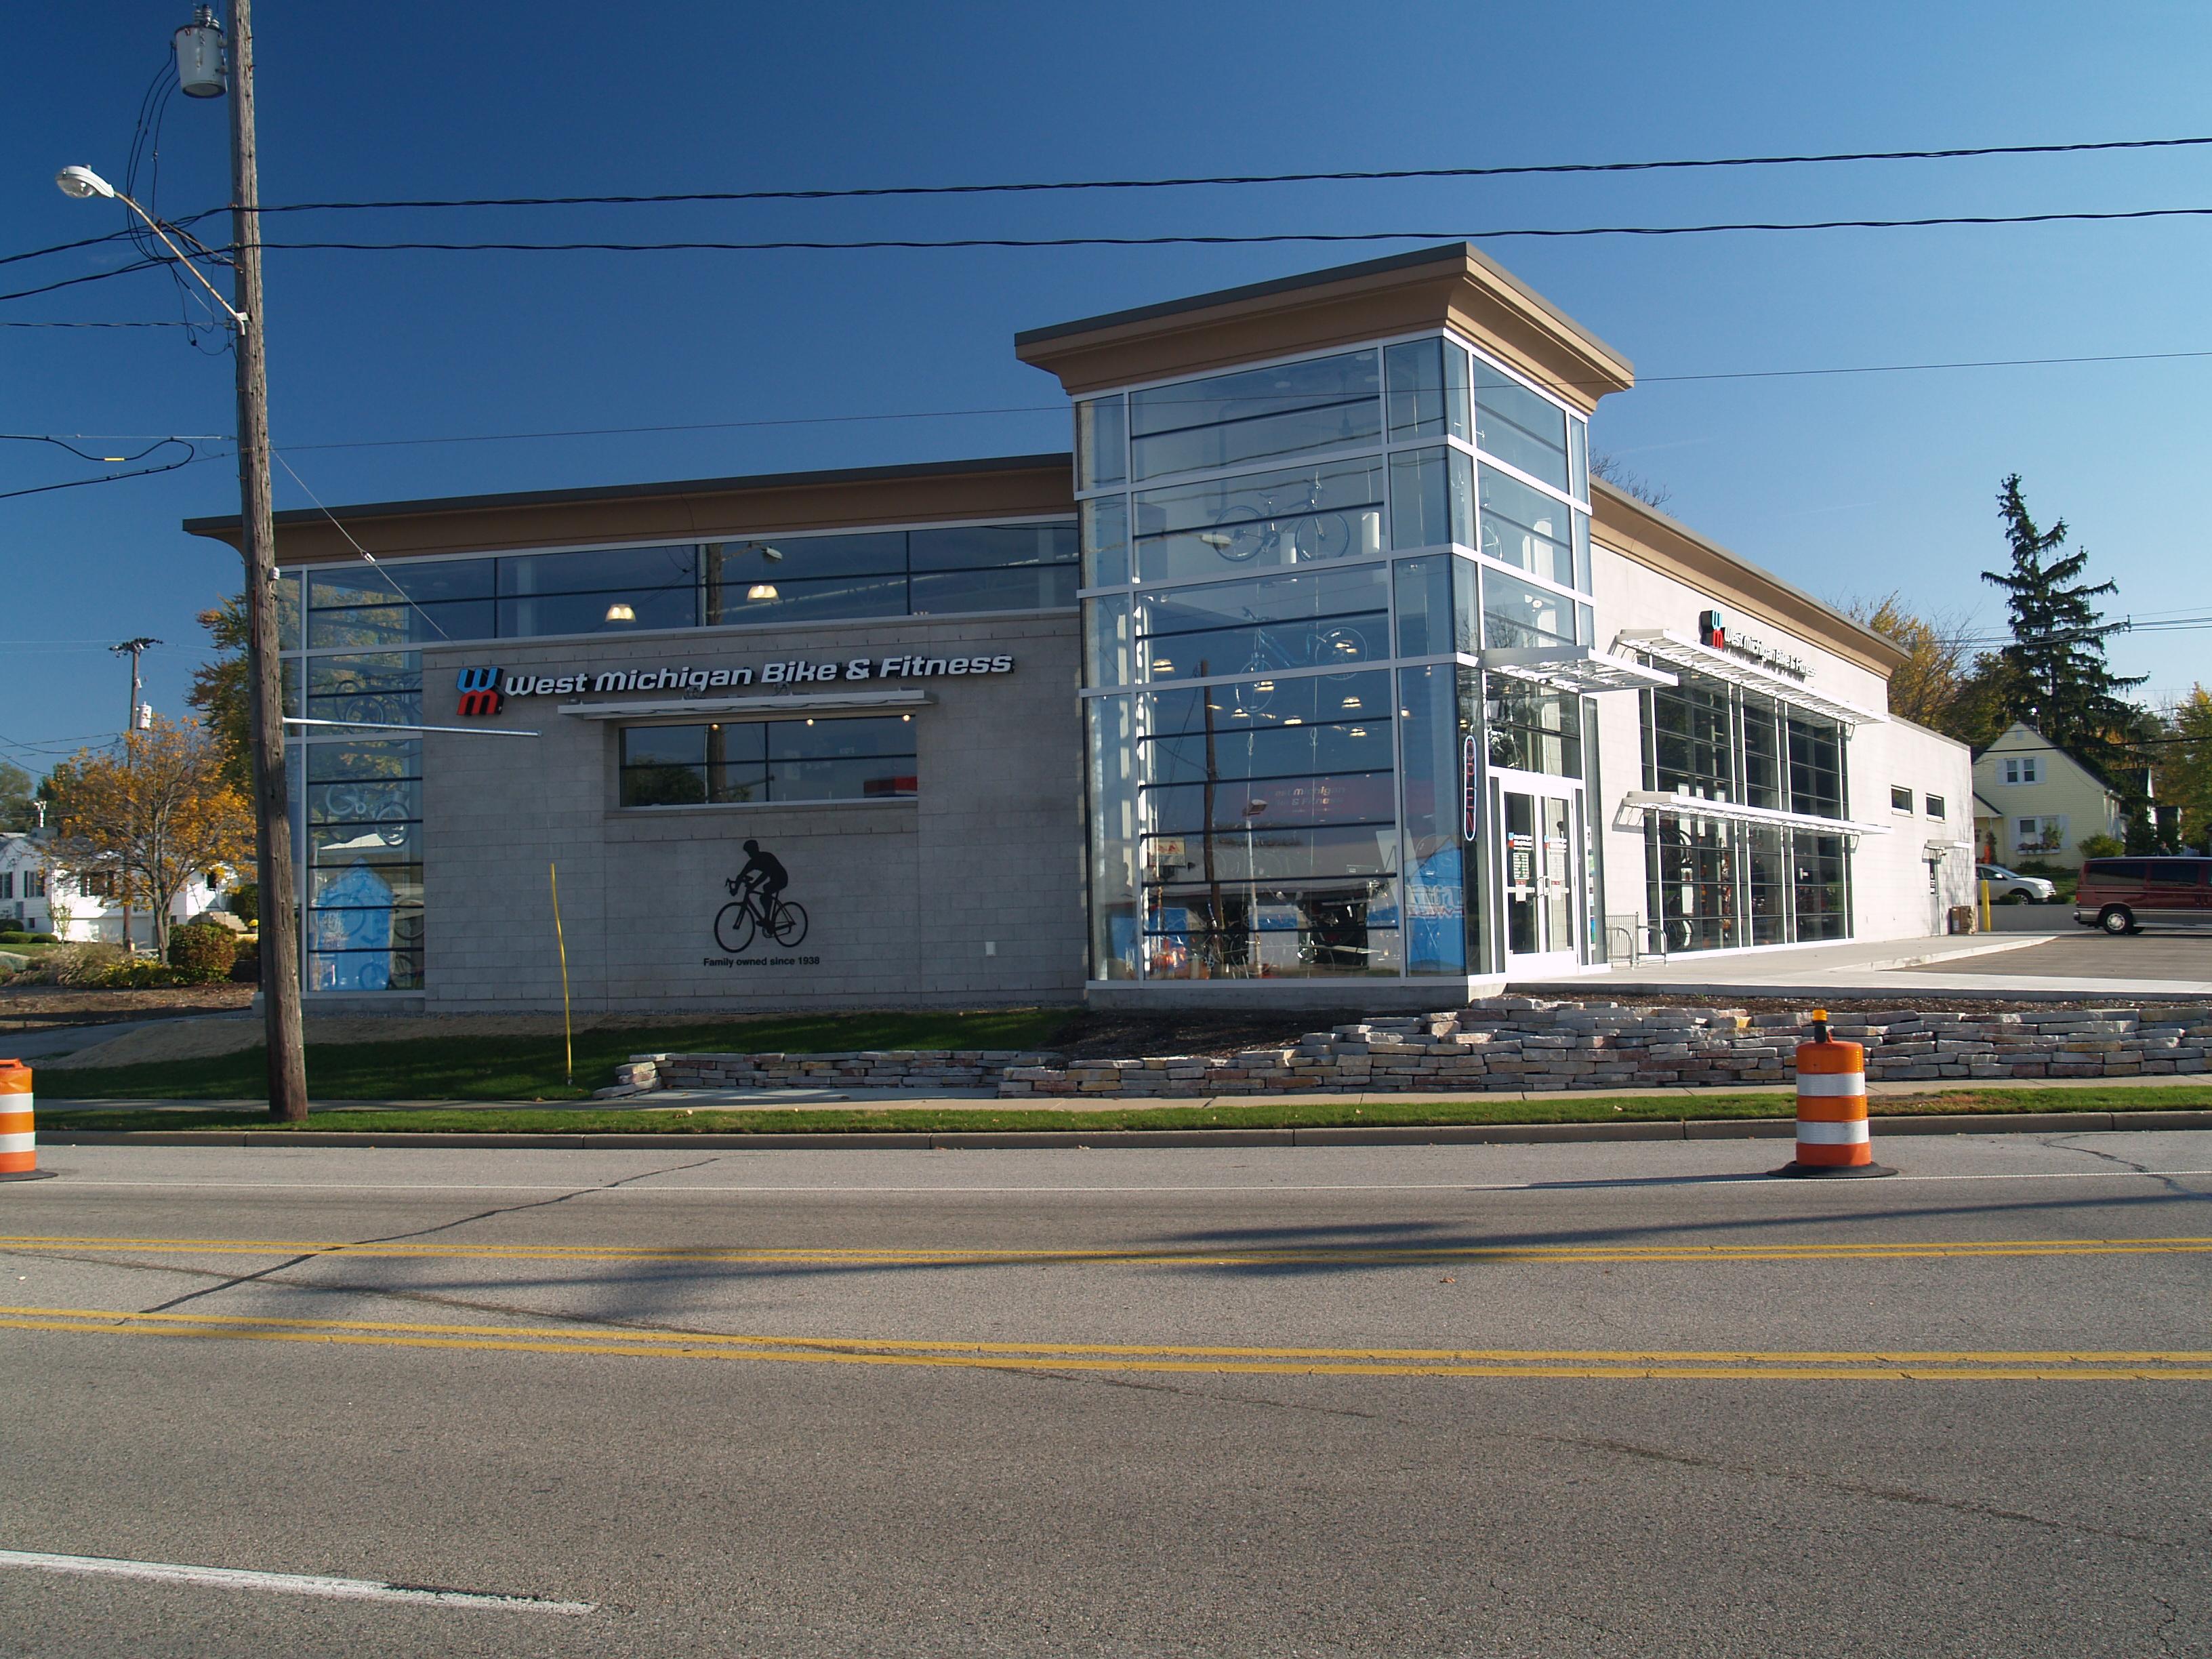 2012-10-16 074